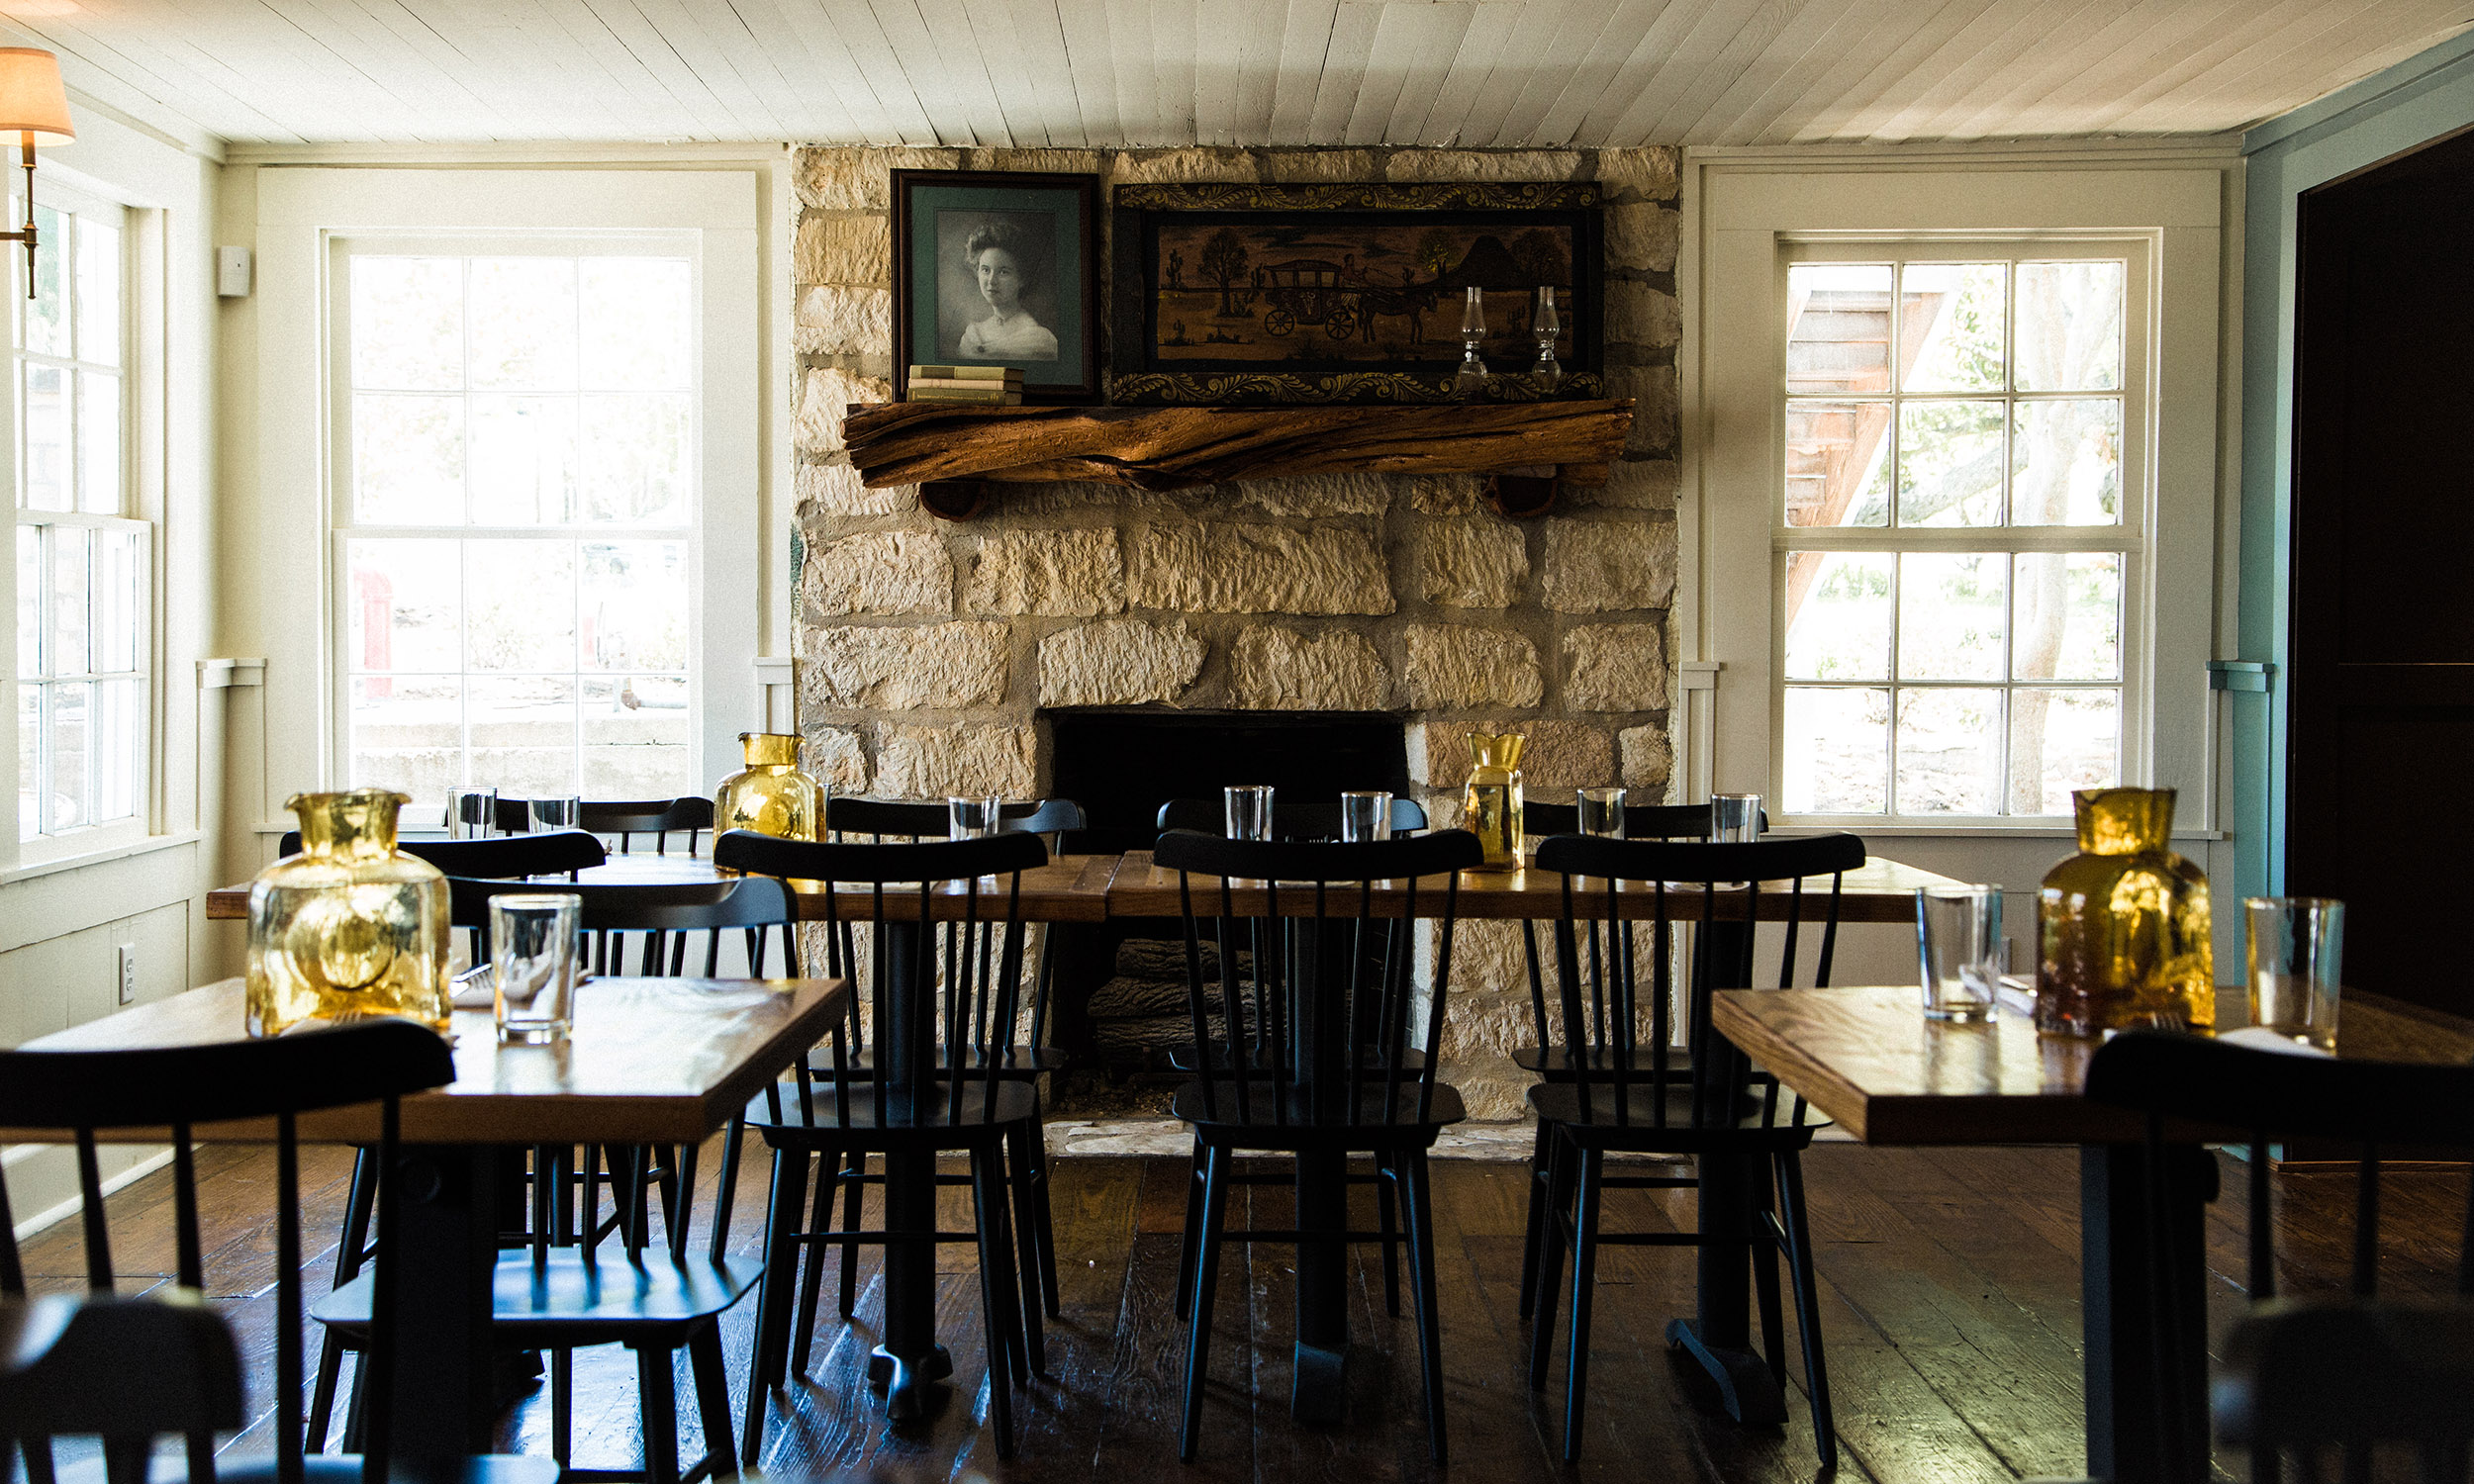 Stagecoach Inn_dining-room-fireplace.jpg